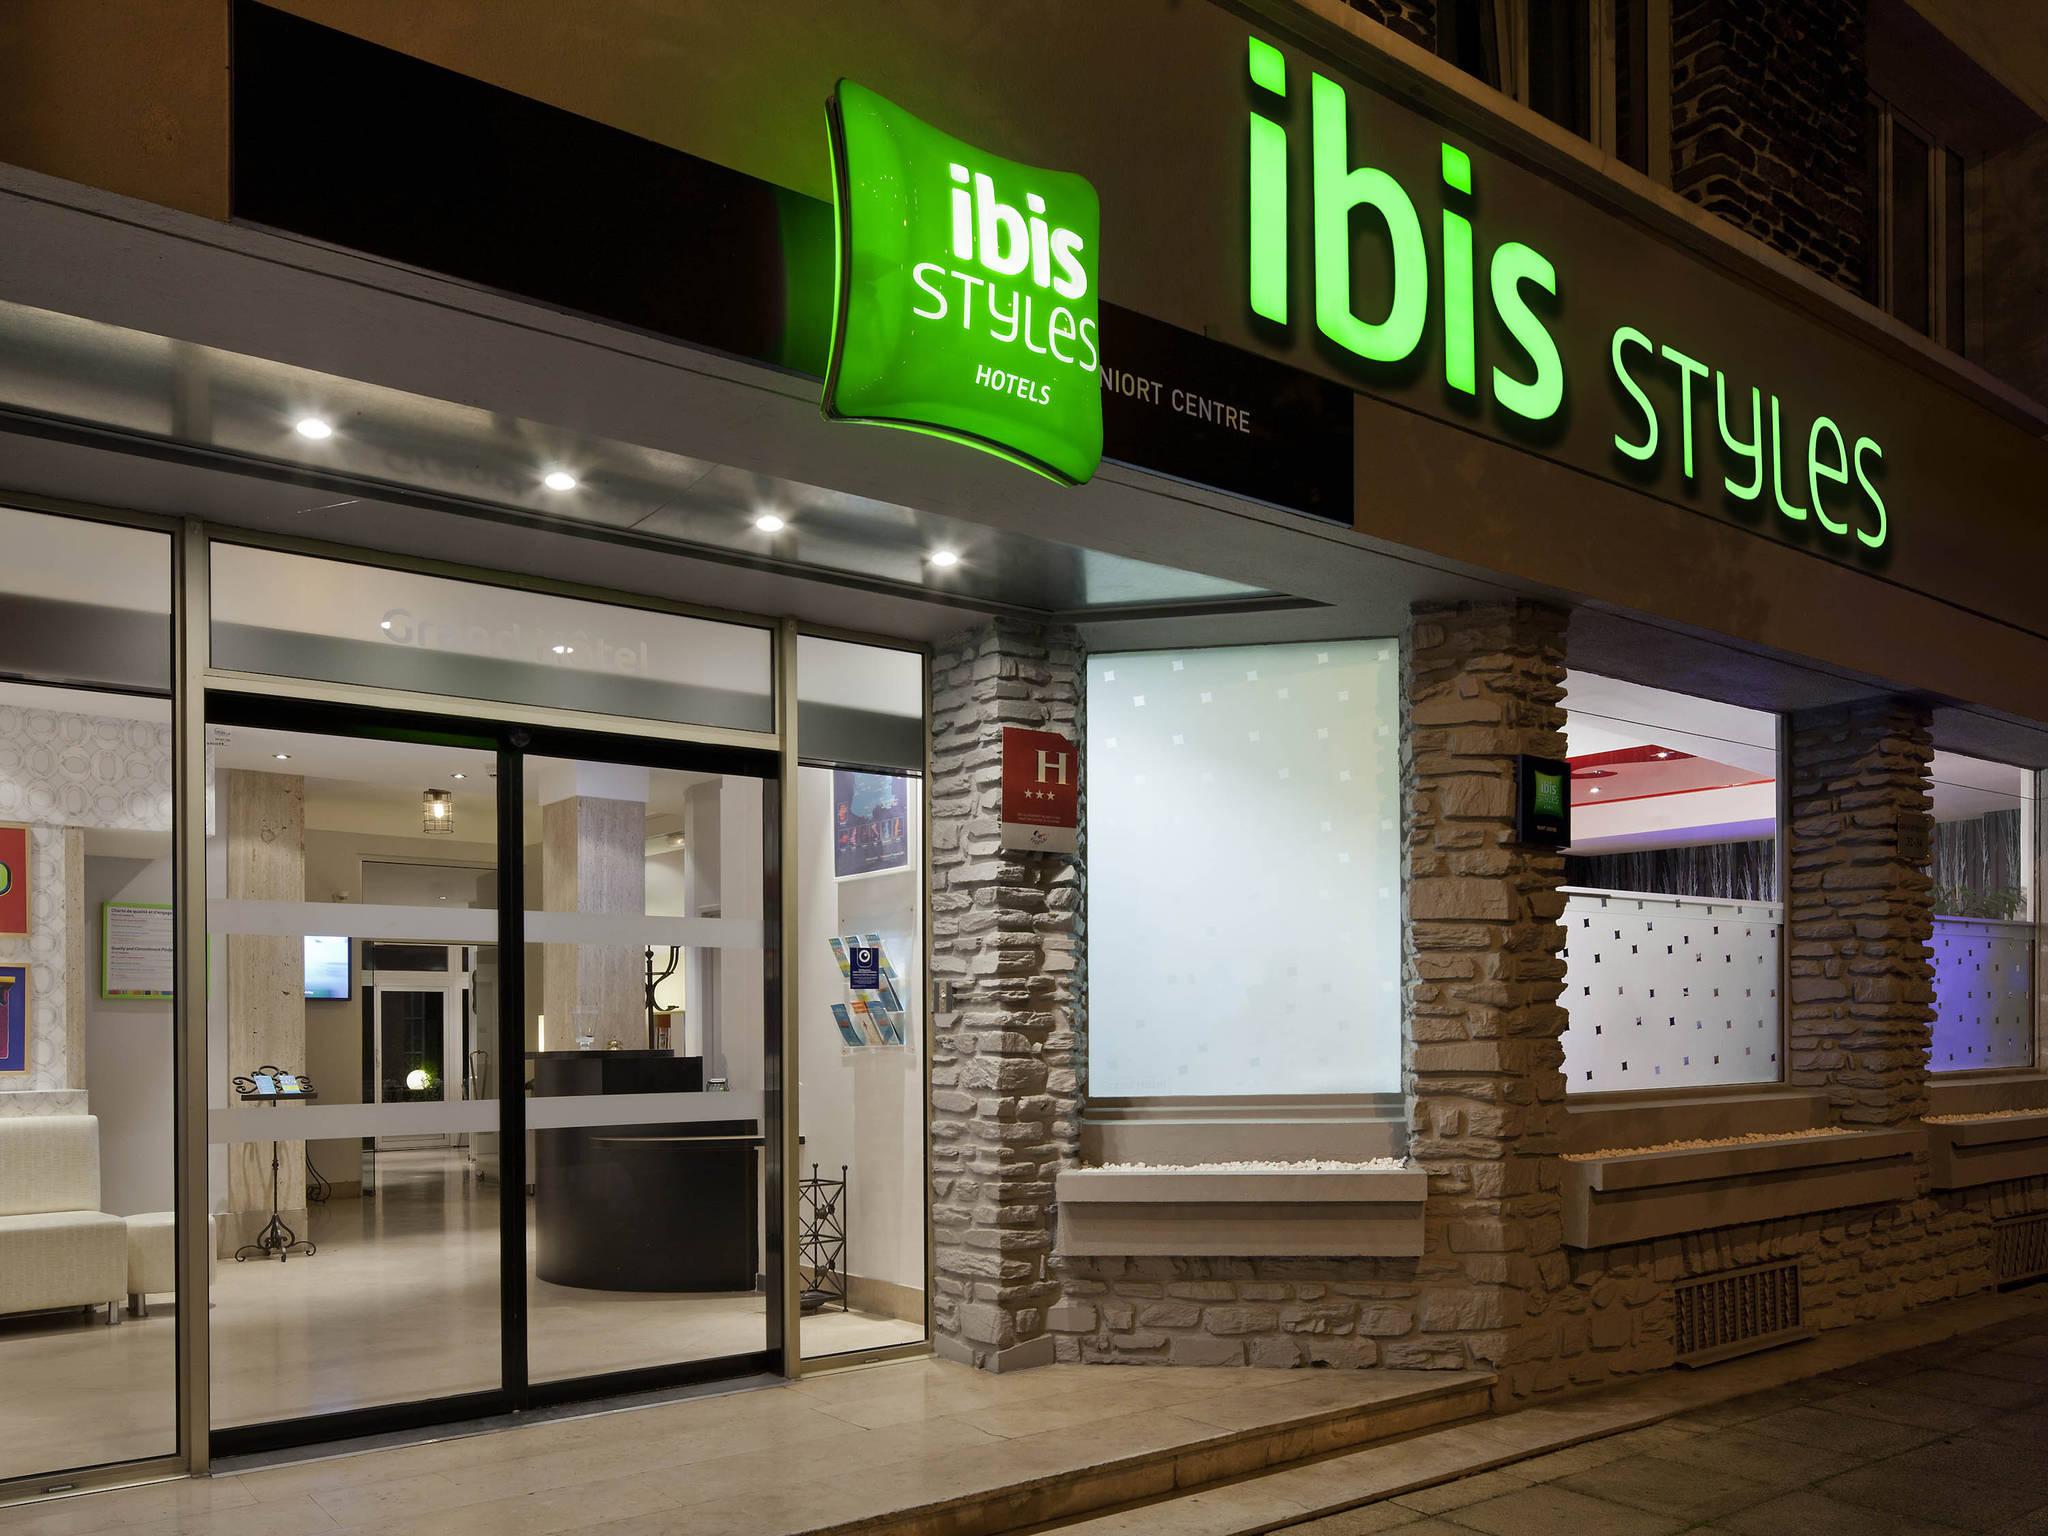 Hotel – Grand Hotel ibis Styles Niort Centre